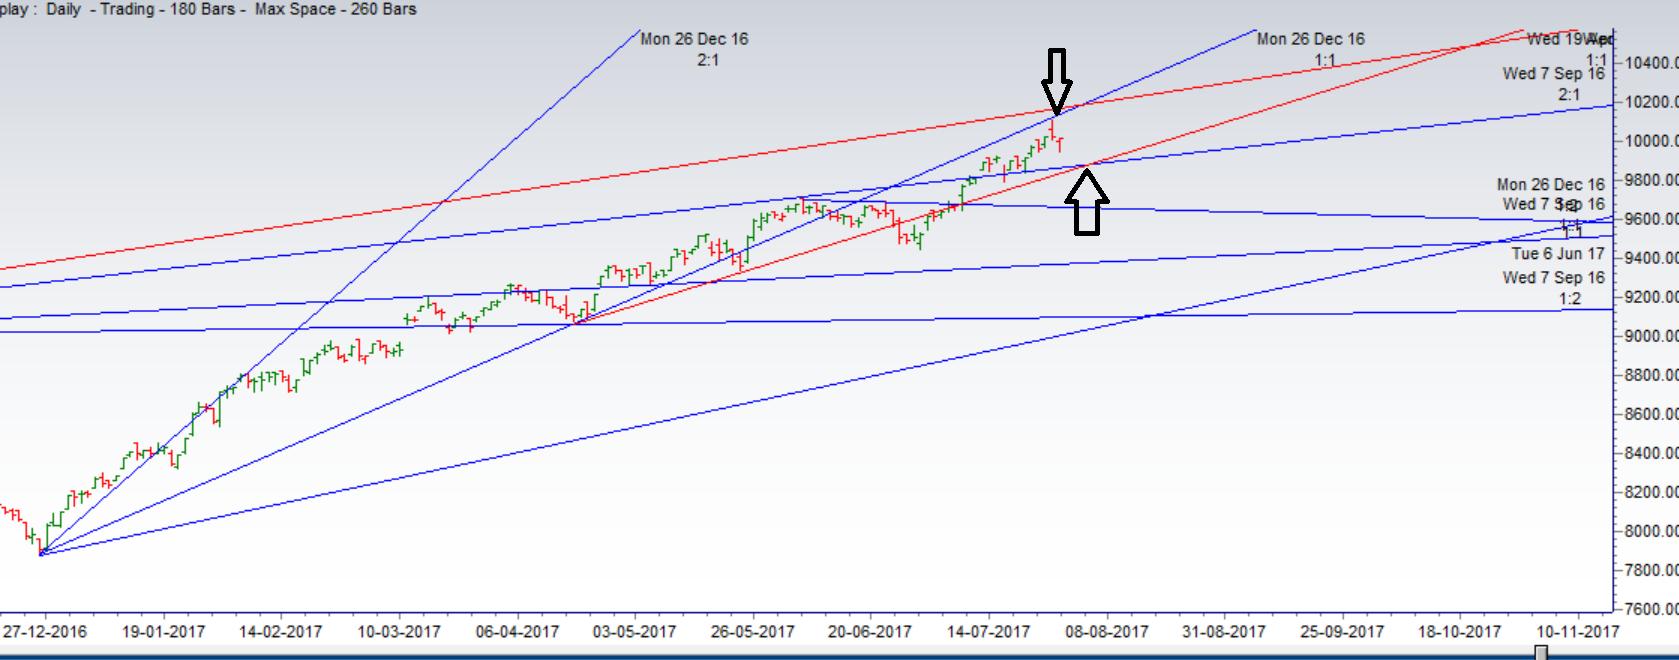 Nifty Trading using Gann Angle